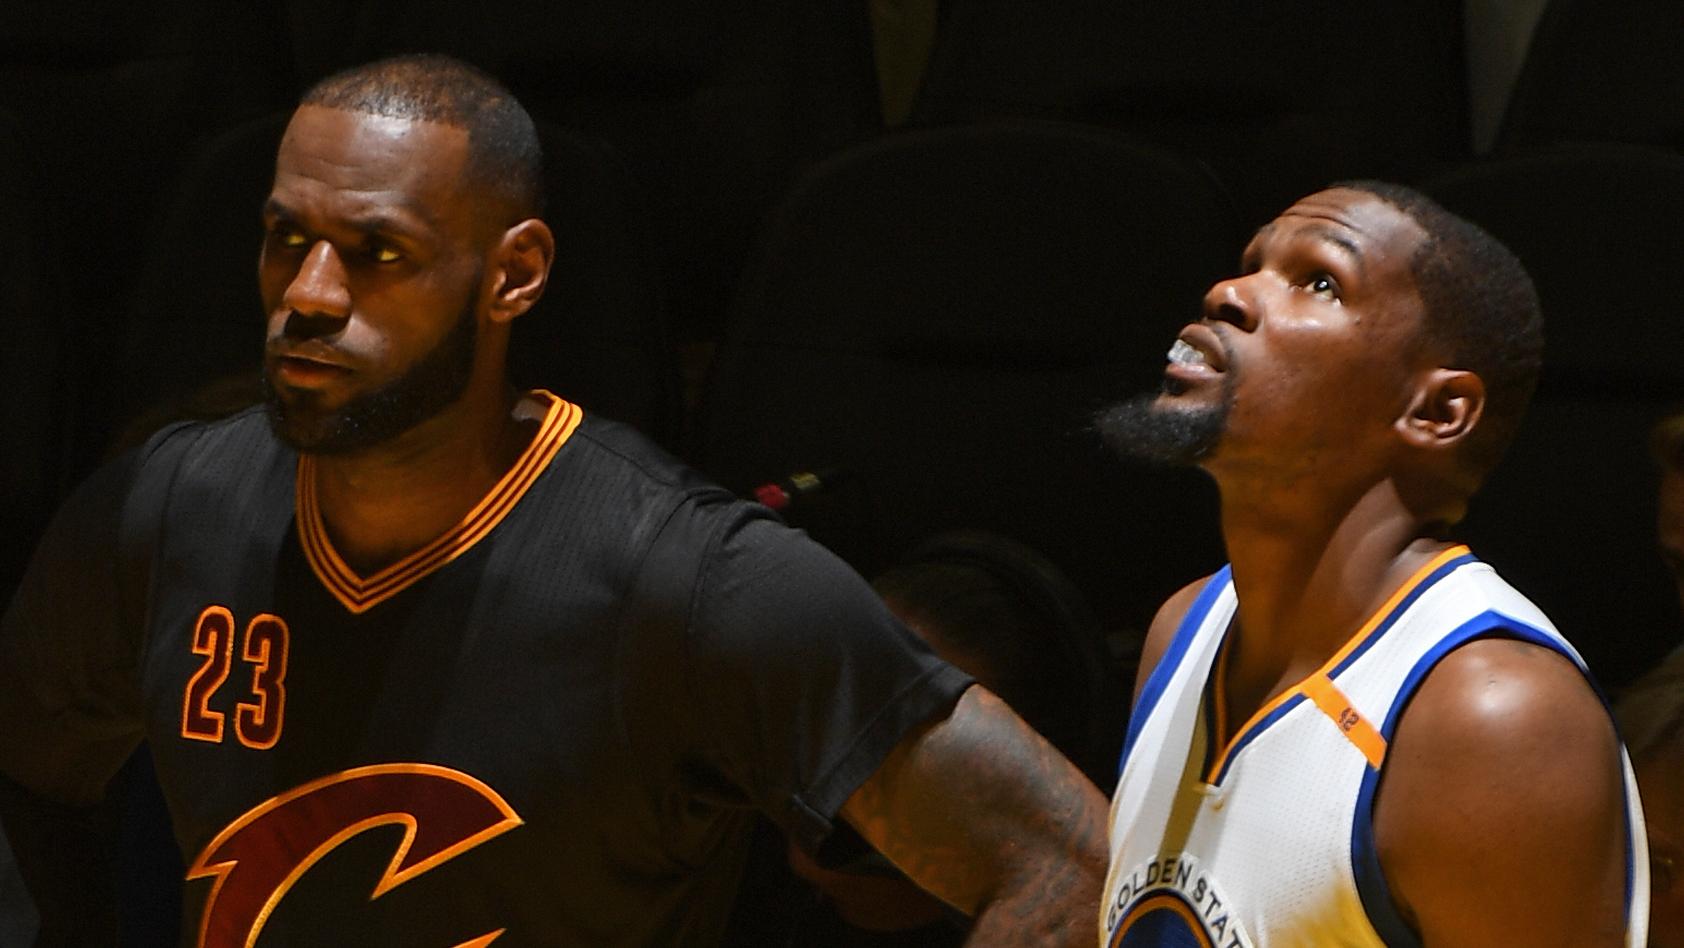 NBA現役十大瘋狂小前鋒:「我將打爆一切」,「未來是我的」